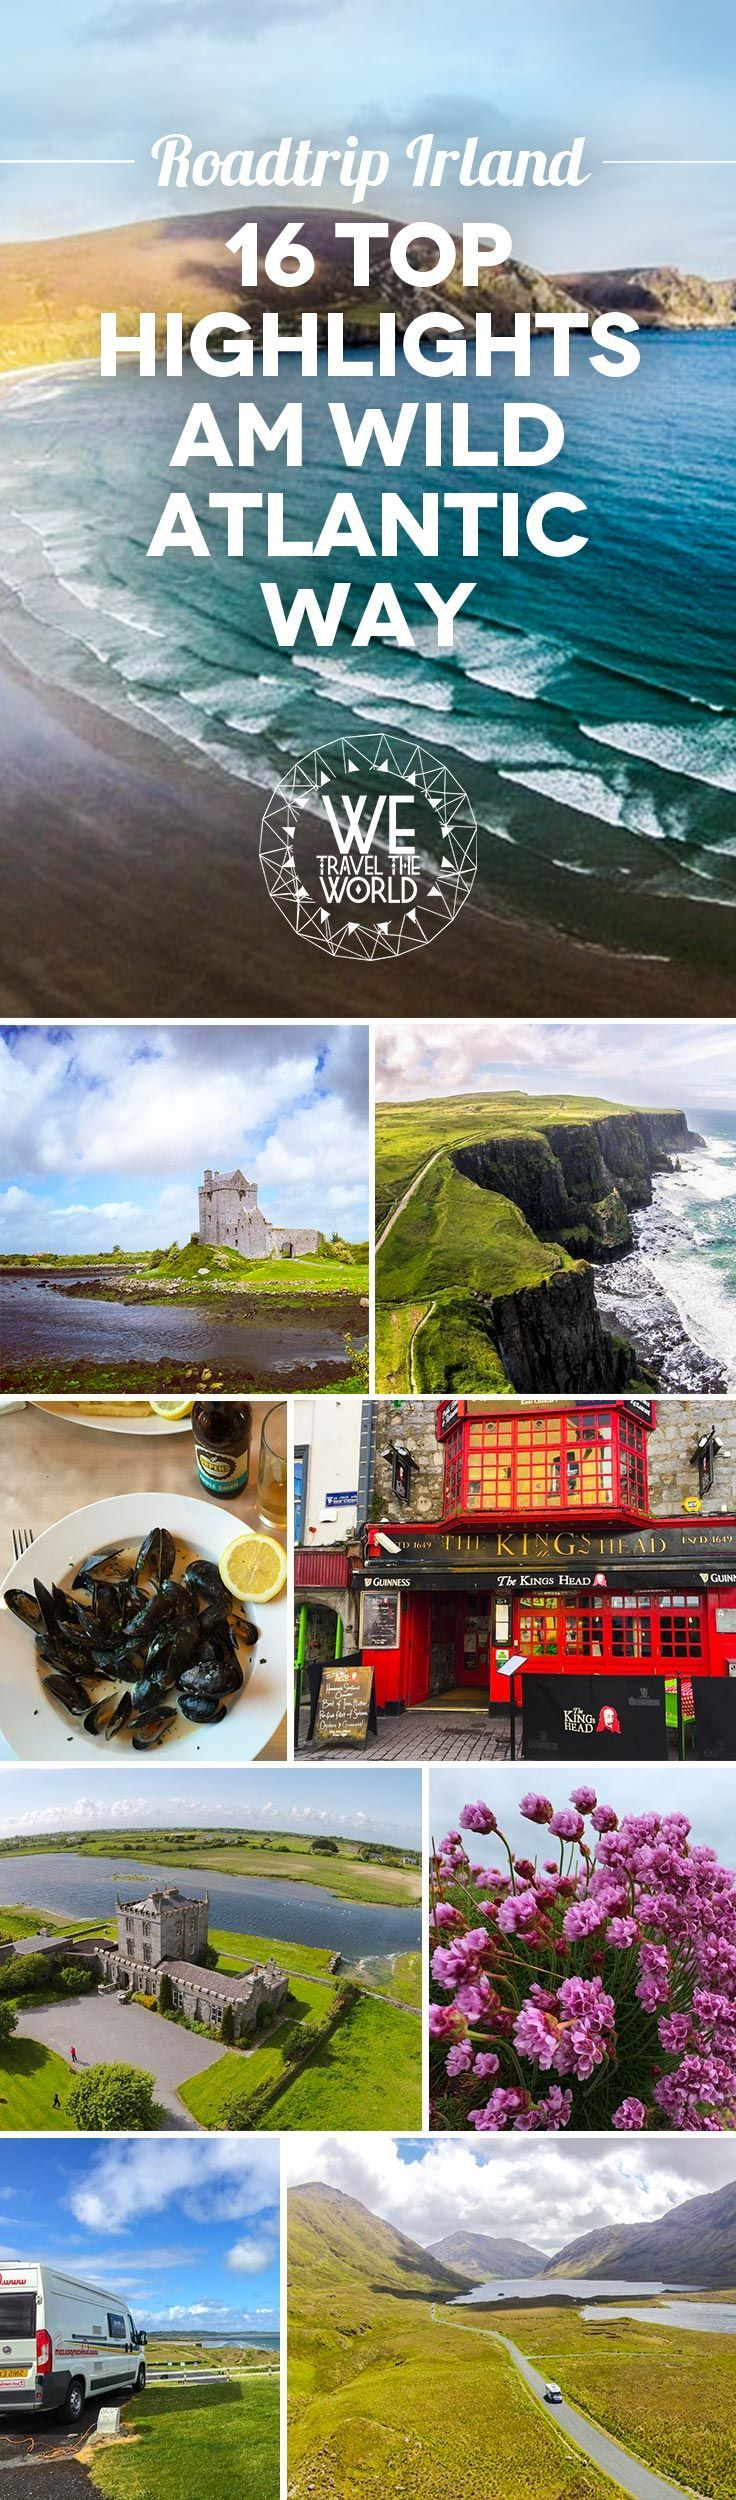 Roadtrip Irland: Unsere 16 Top Highlights am Wild Atlantic Way, inkl. Cliffs of Moher